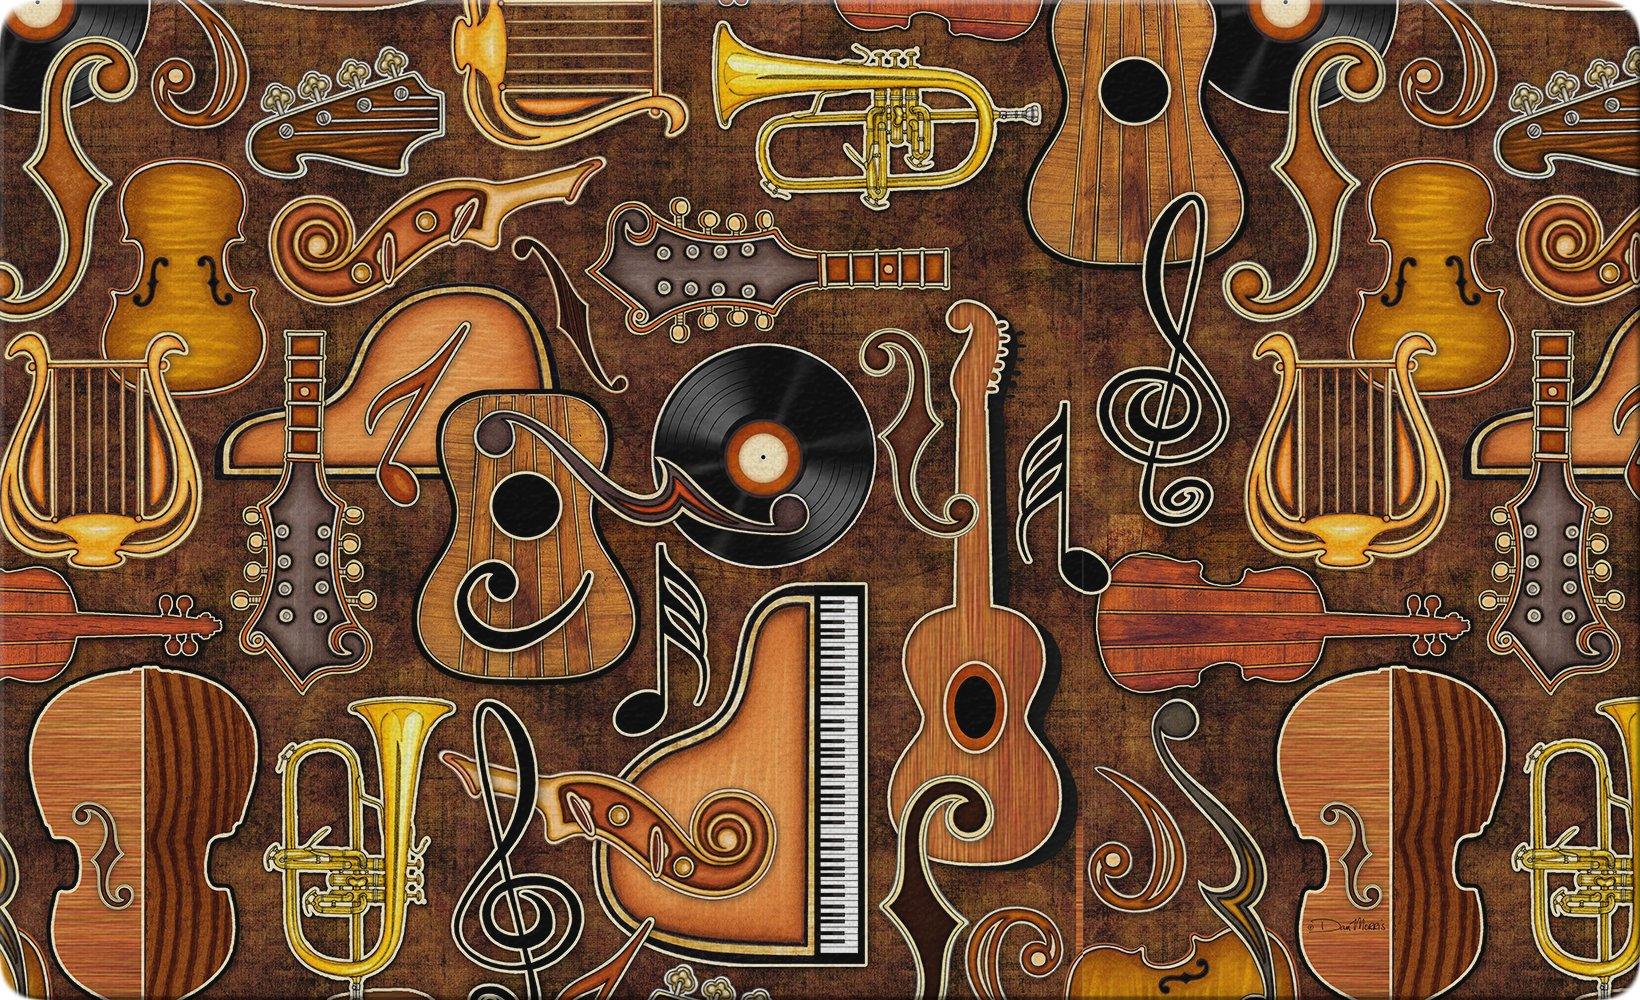 Toland Home Garden Joyful Noise 18 x 30 Inch Decorative Music Floor Mat Instrument Collage Doormat